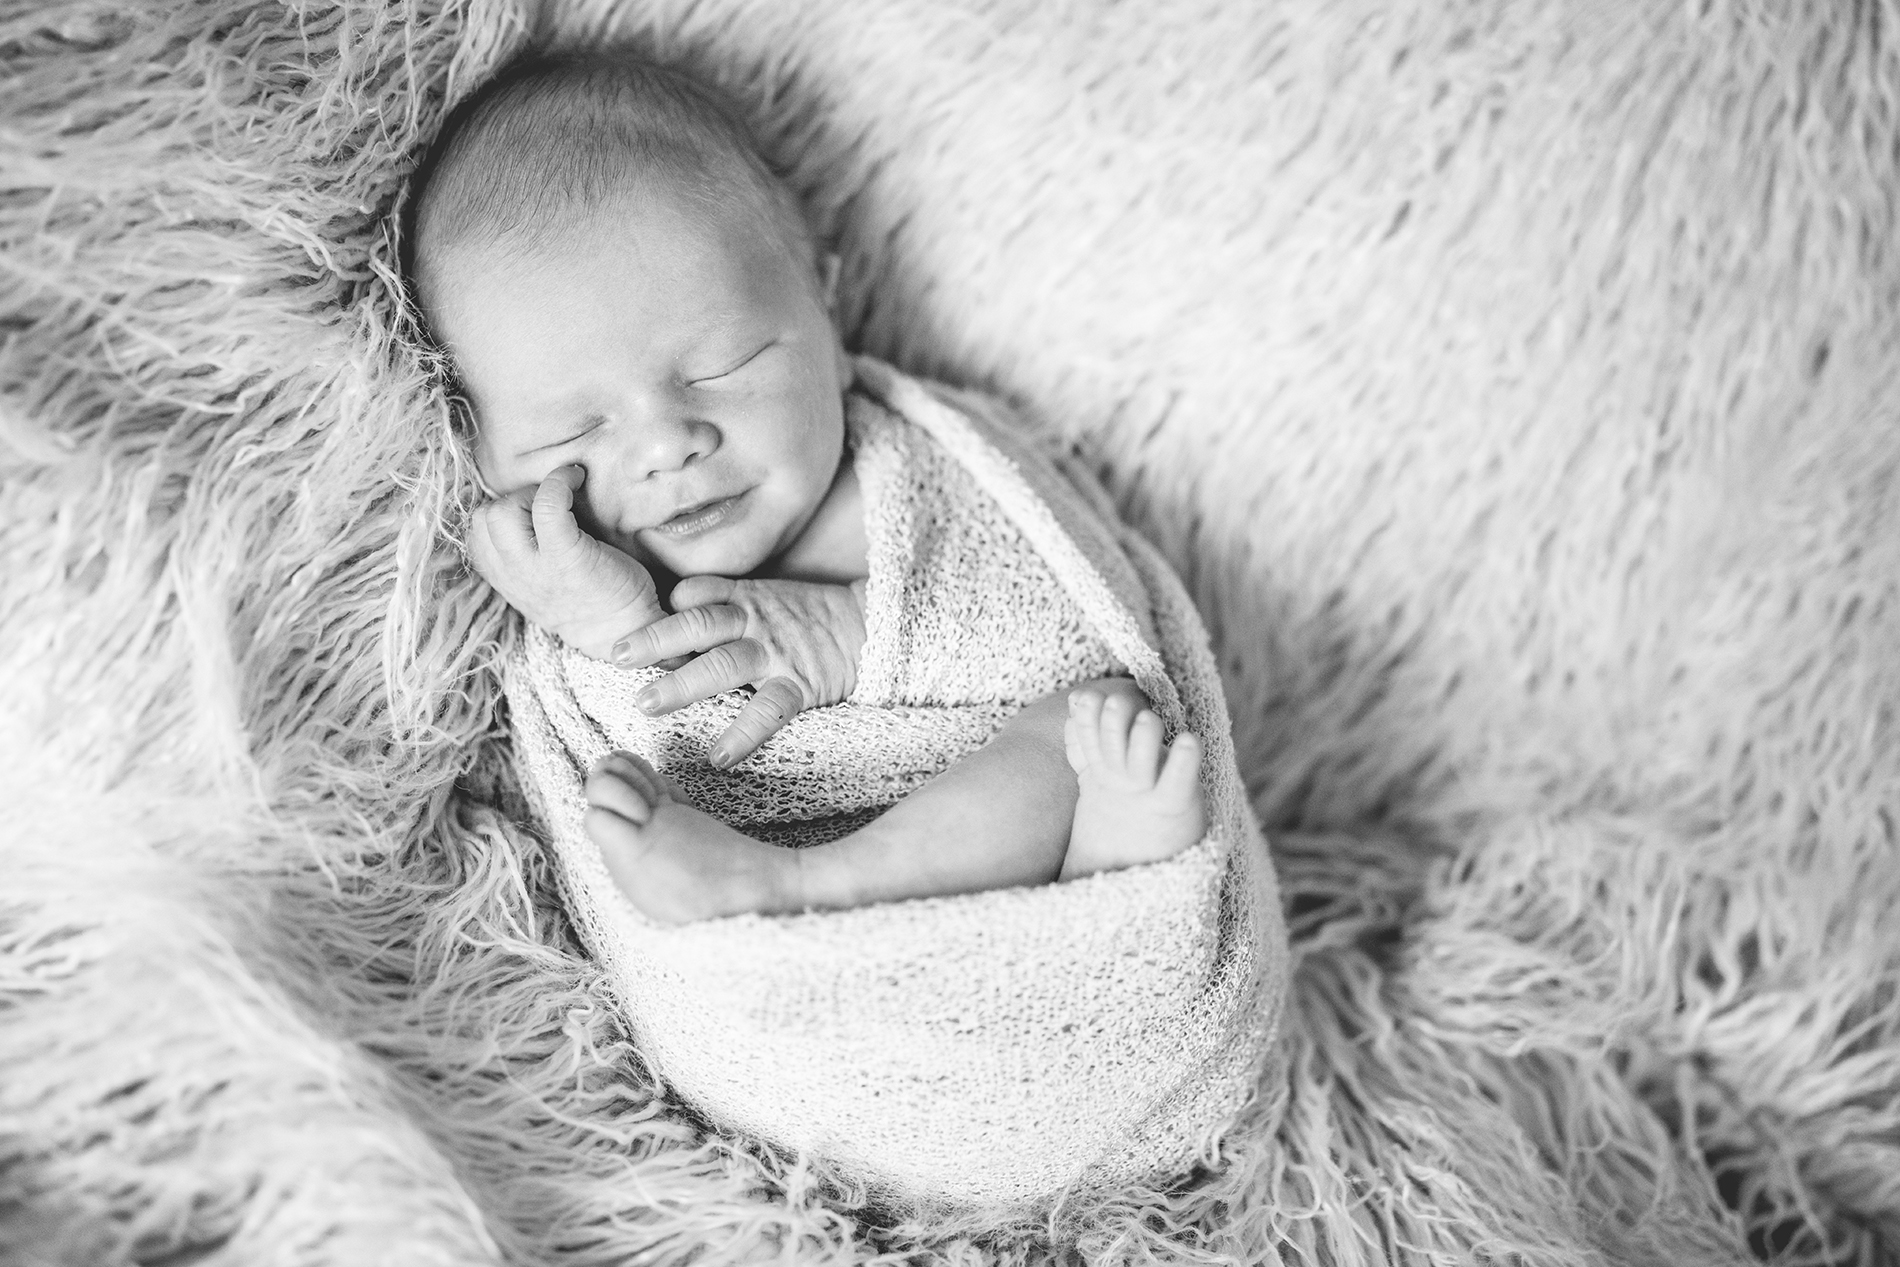 New born fotografie